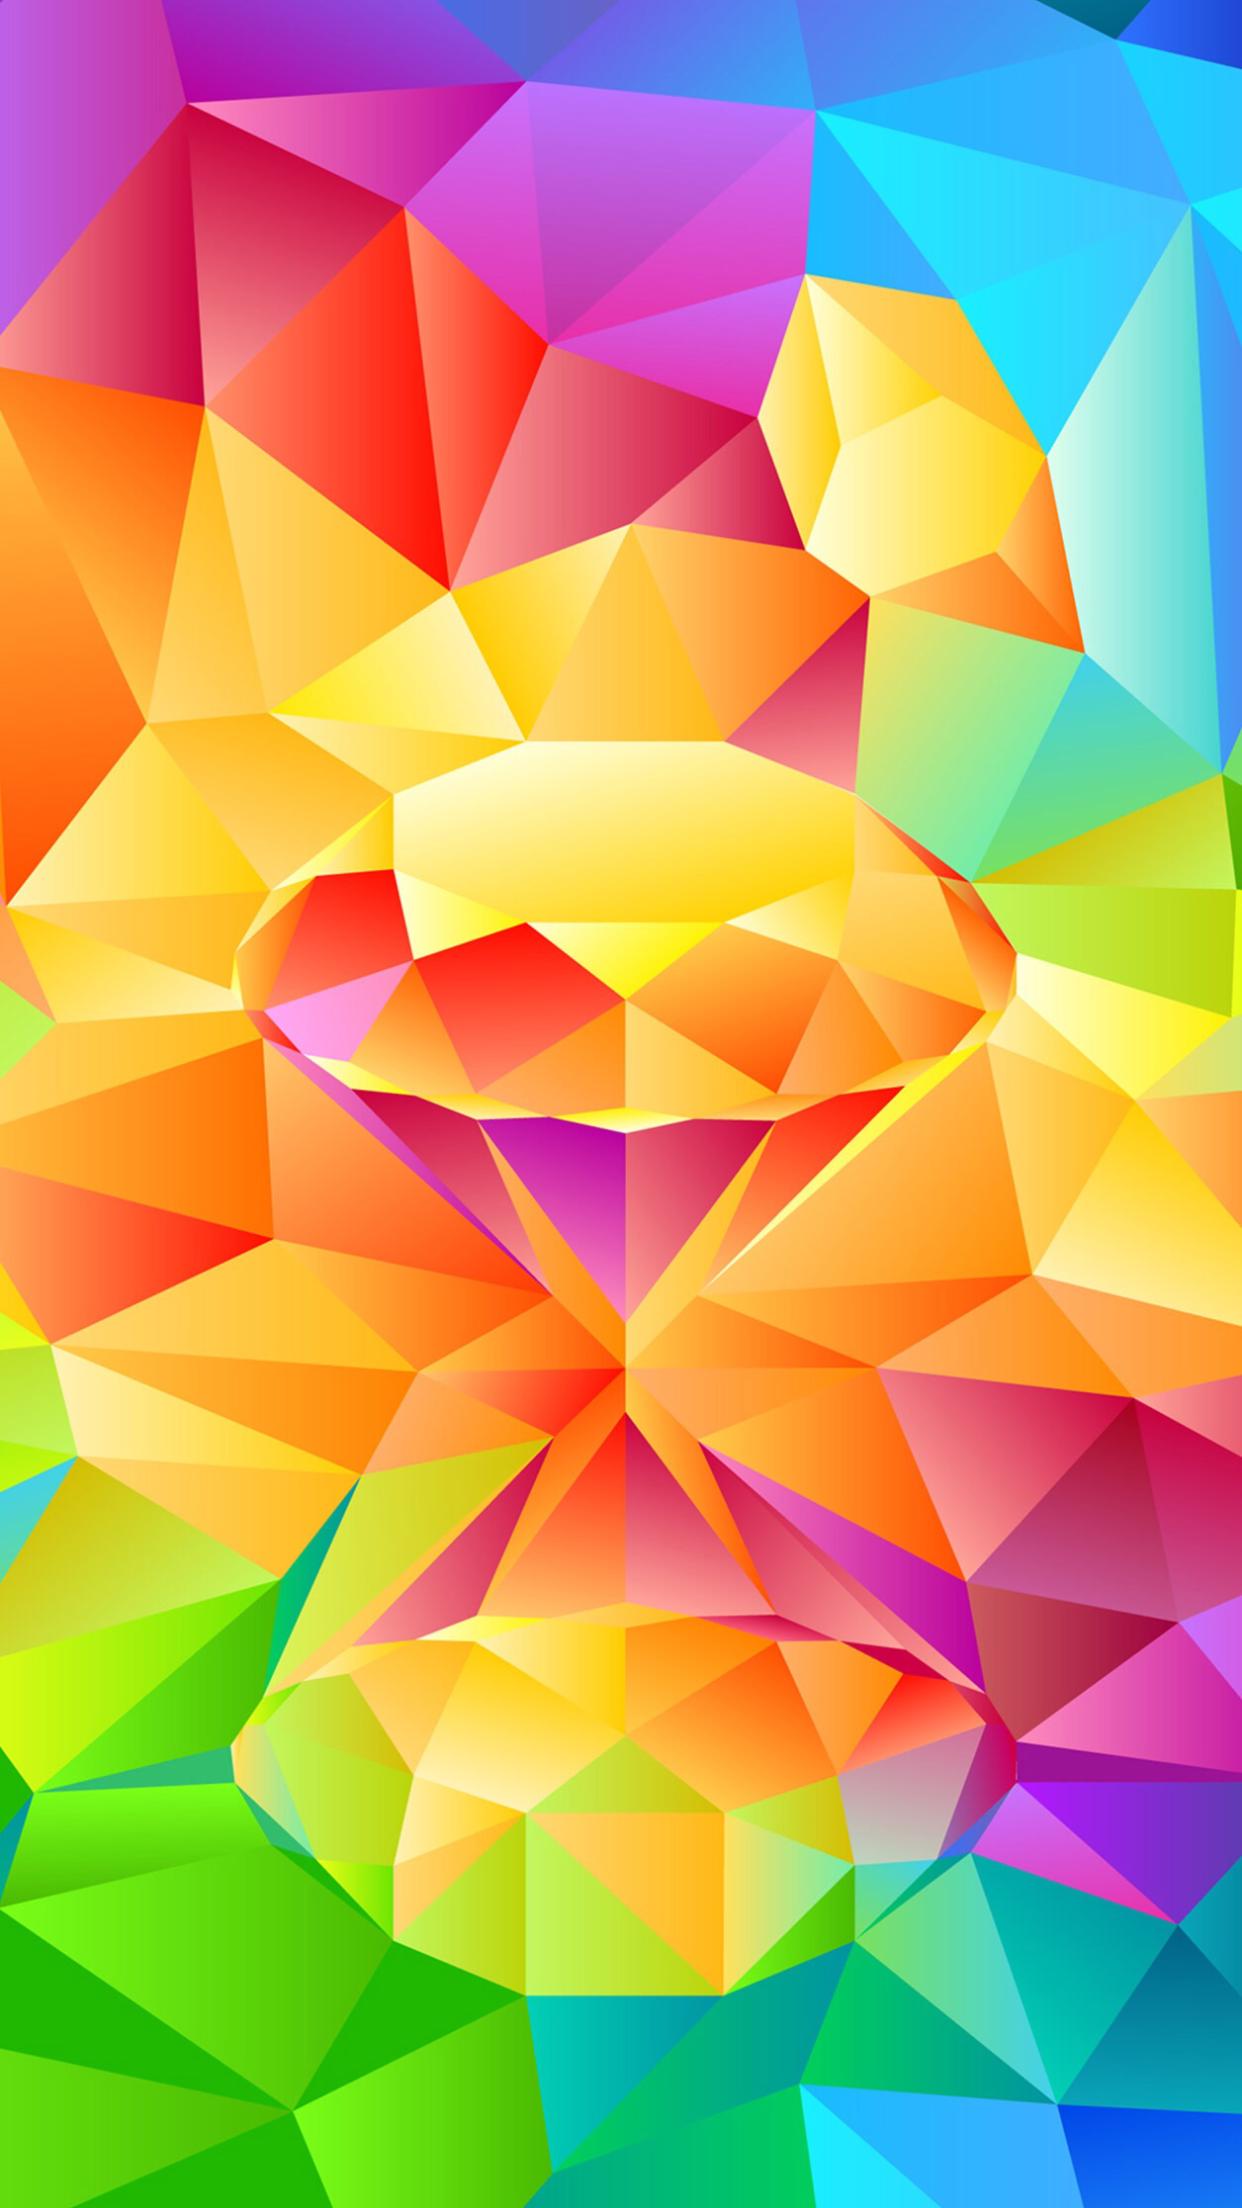 Wallpaper By Artist Unknown Rainbow Wallpaper Diamond Wallpaper Iphone Galaxy Wallpaper